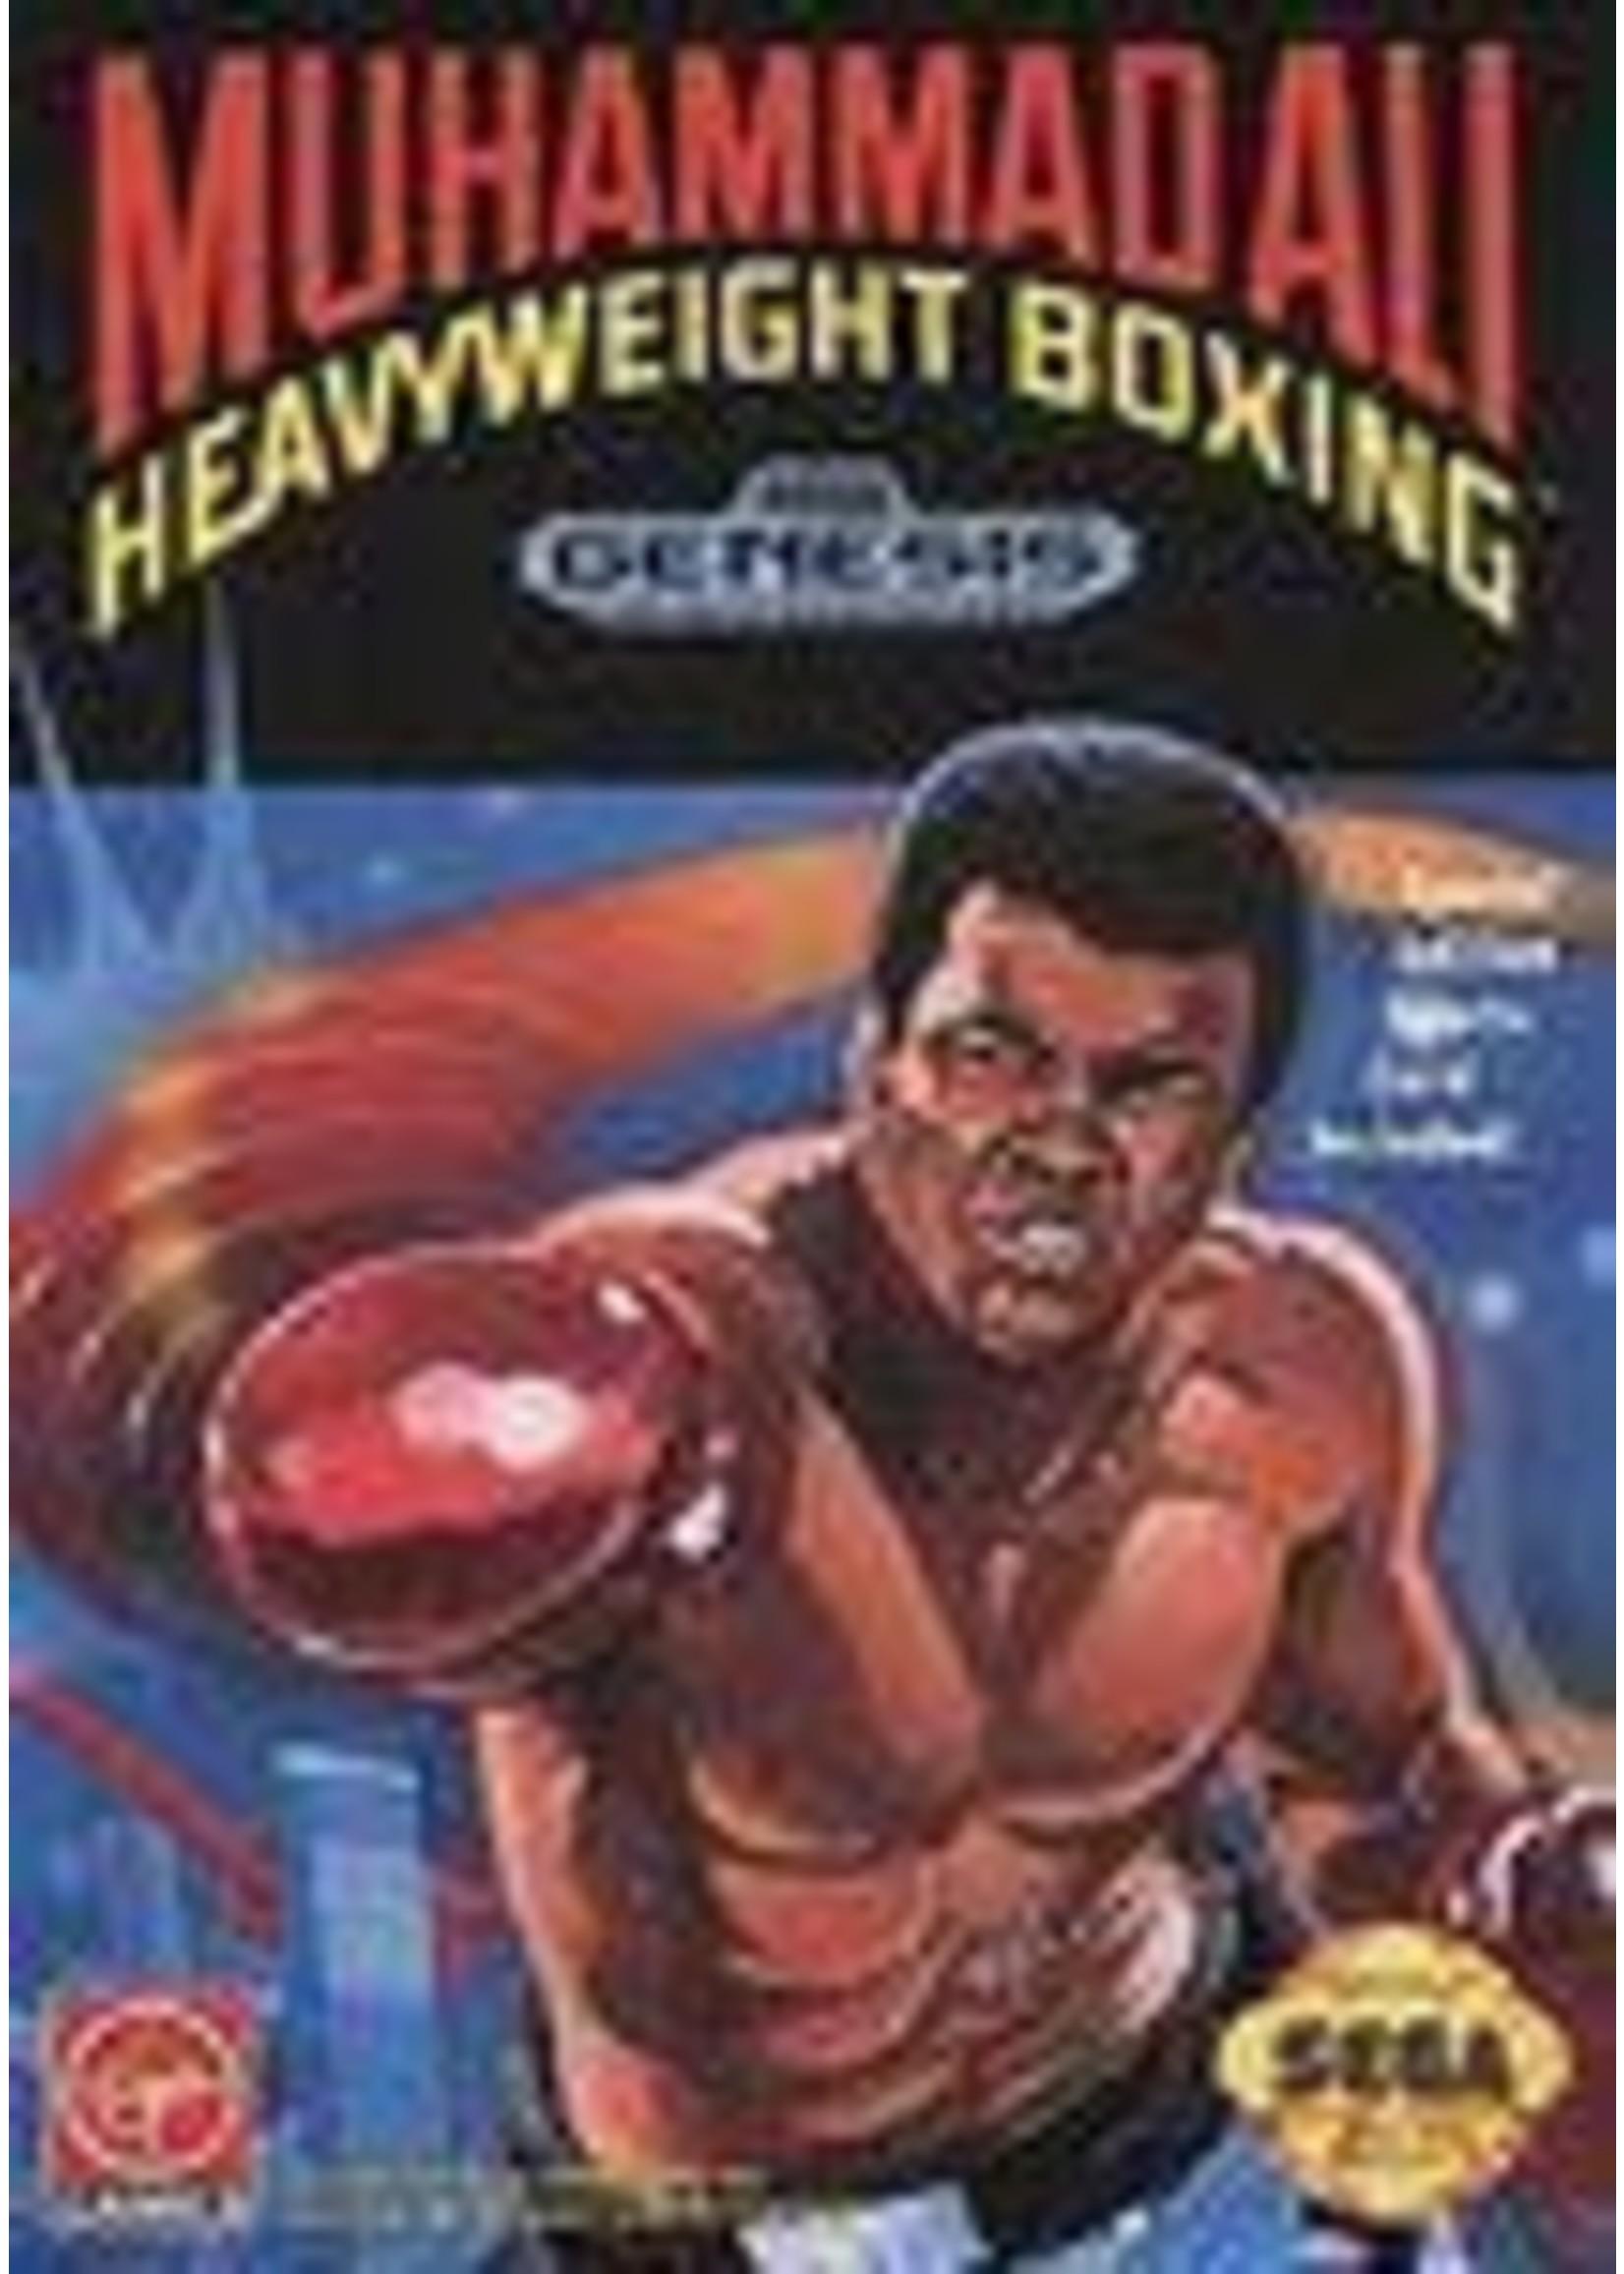 Muhammad Ali Heavyweight Boxing Sega Genesis